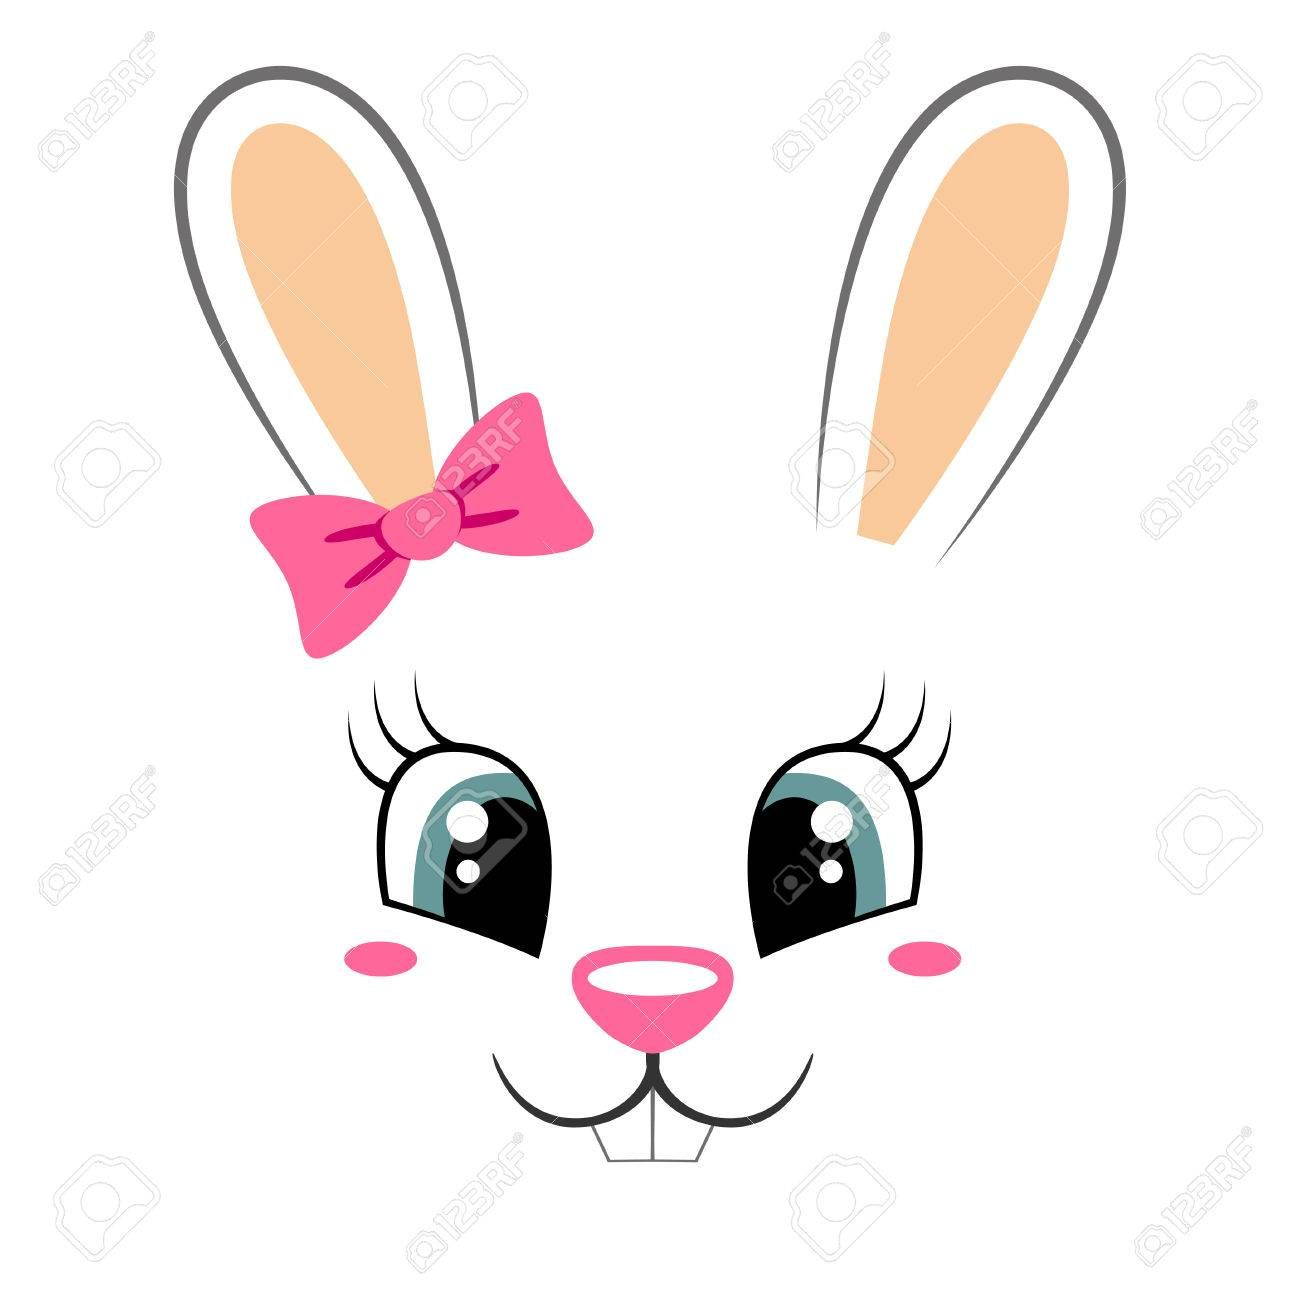 Imagem Relacionada Bunny Face Cartoon Bunny Easter Design